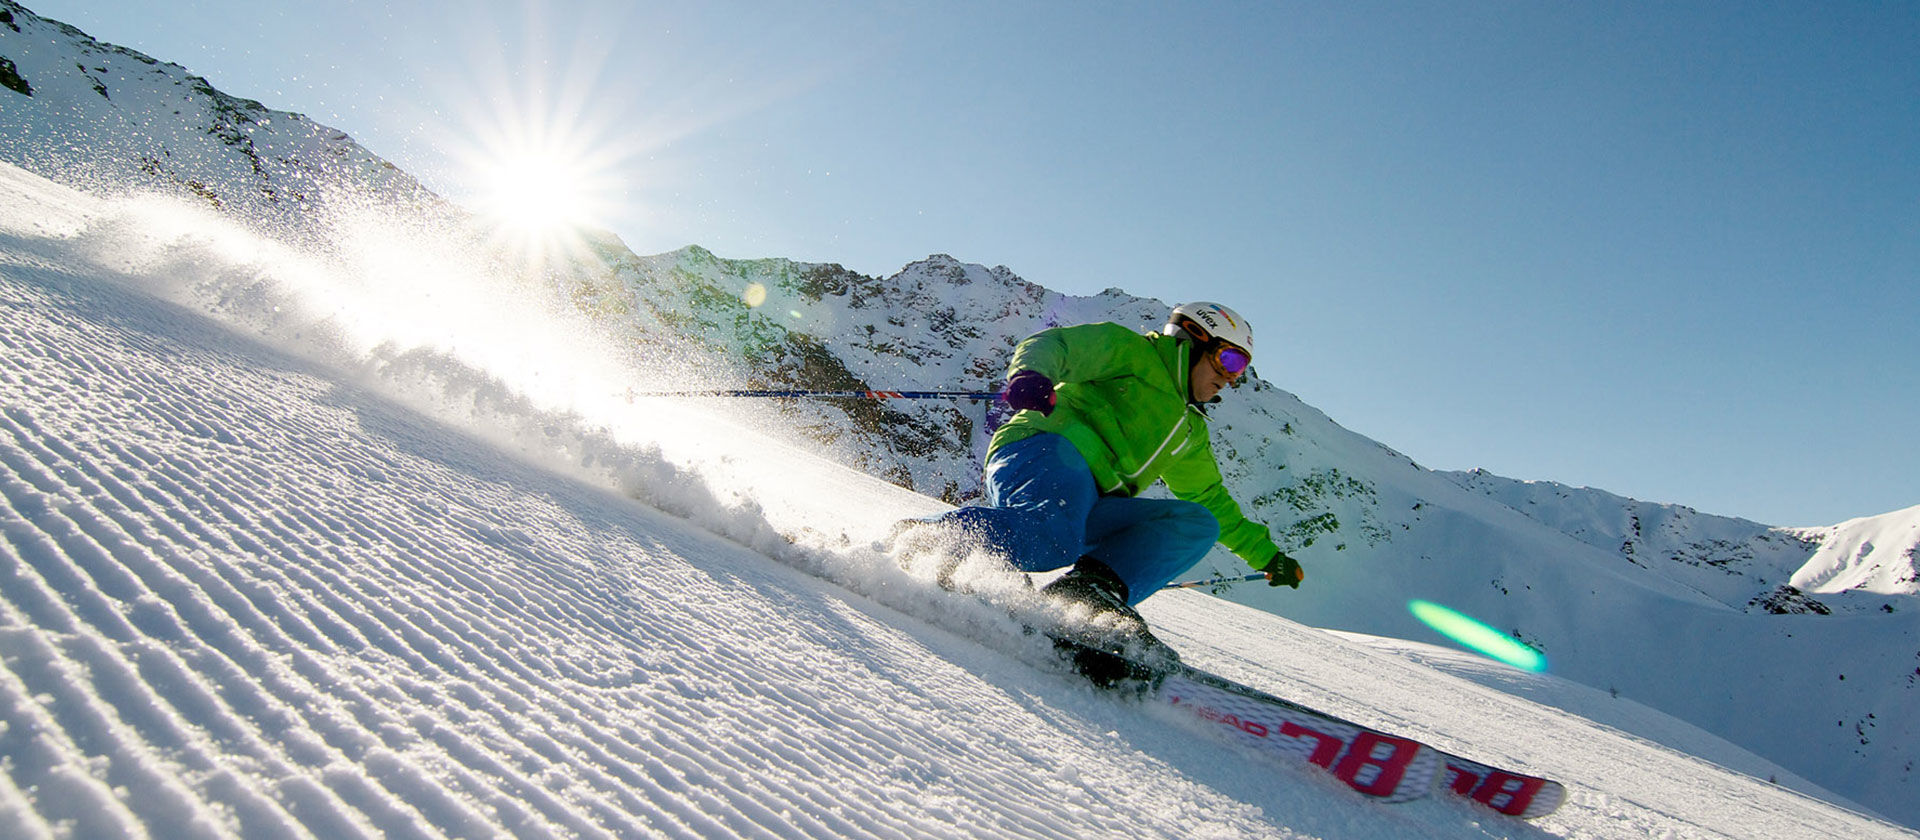 Skifahren im Kaunertal- Foto TVB Kaunertal Martin Lugger